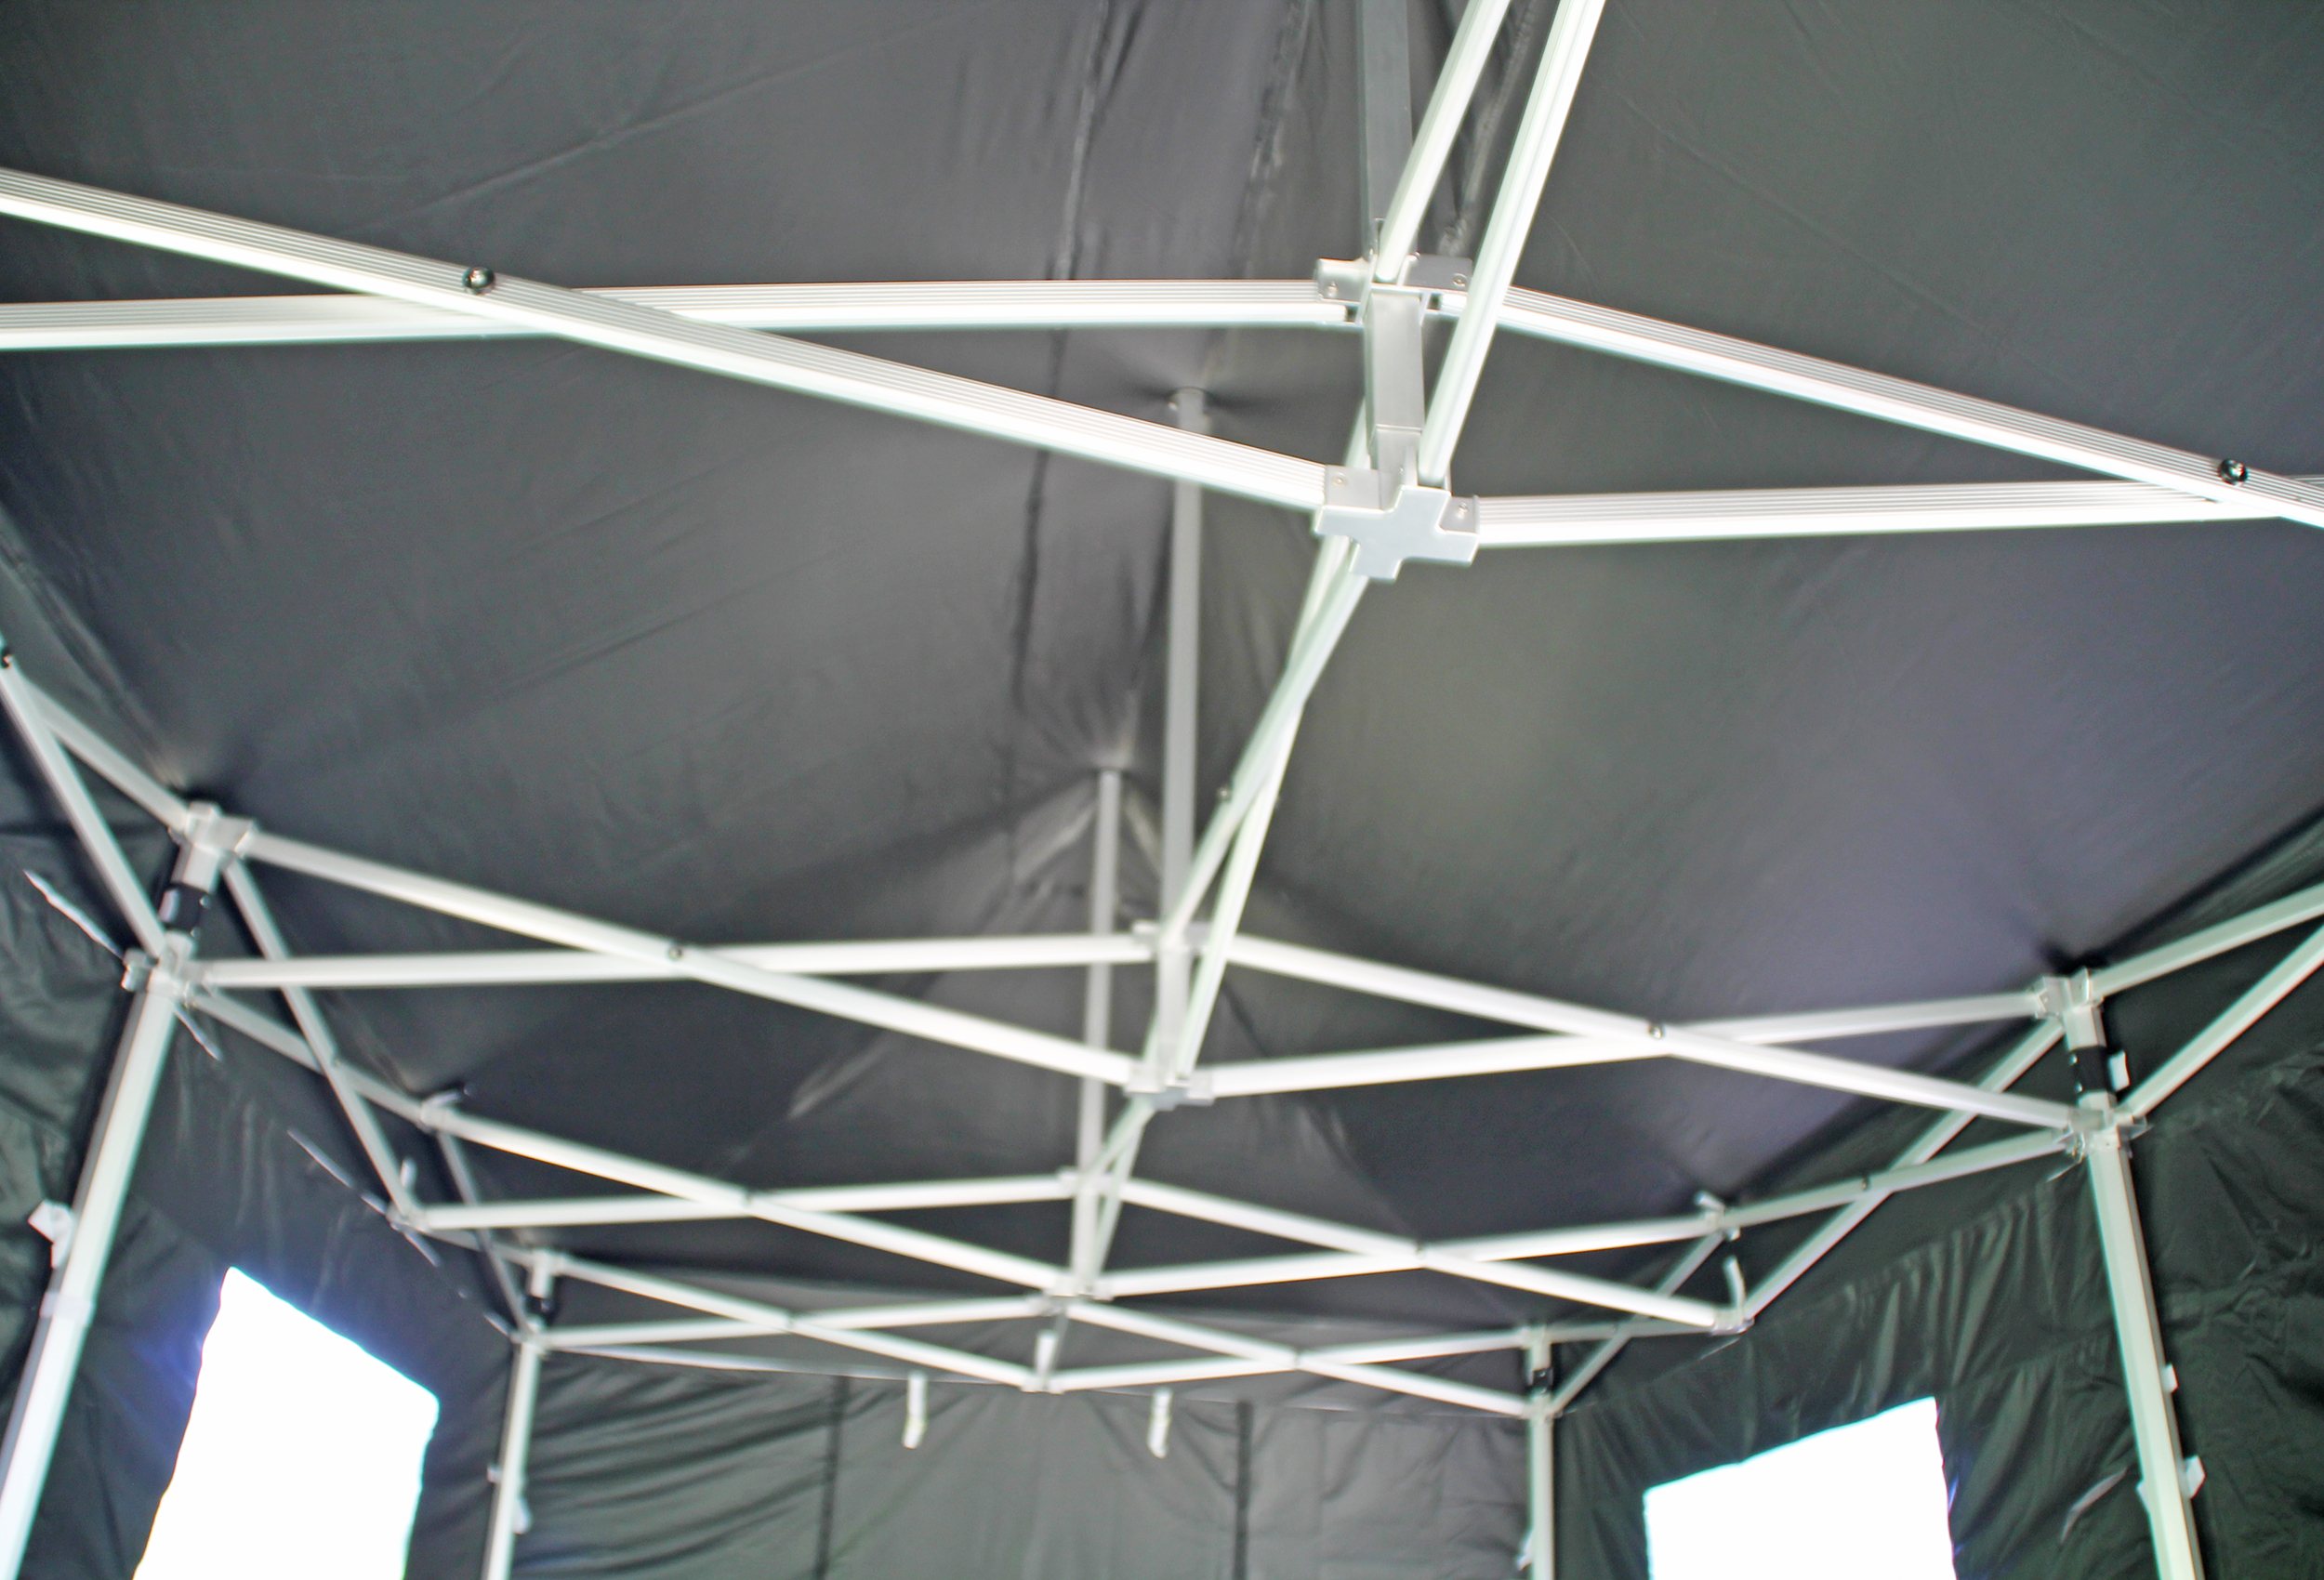 Pavillon-Zubeh-r-Kategorie